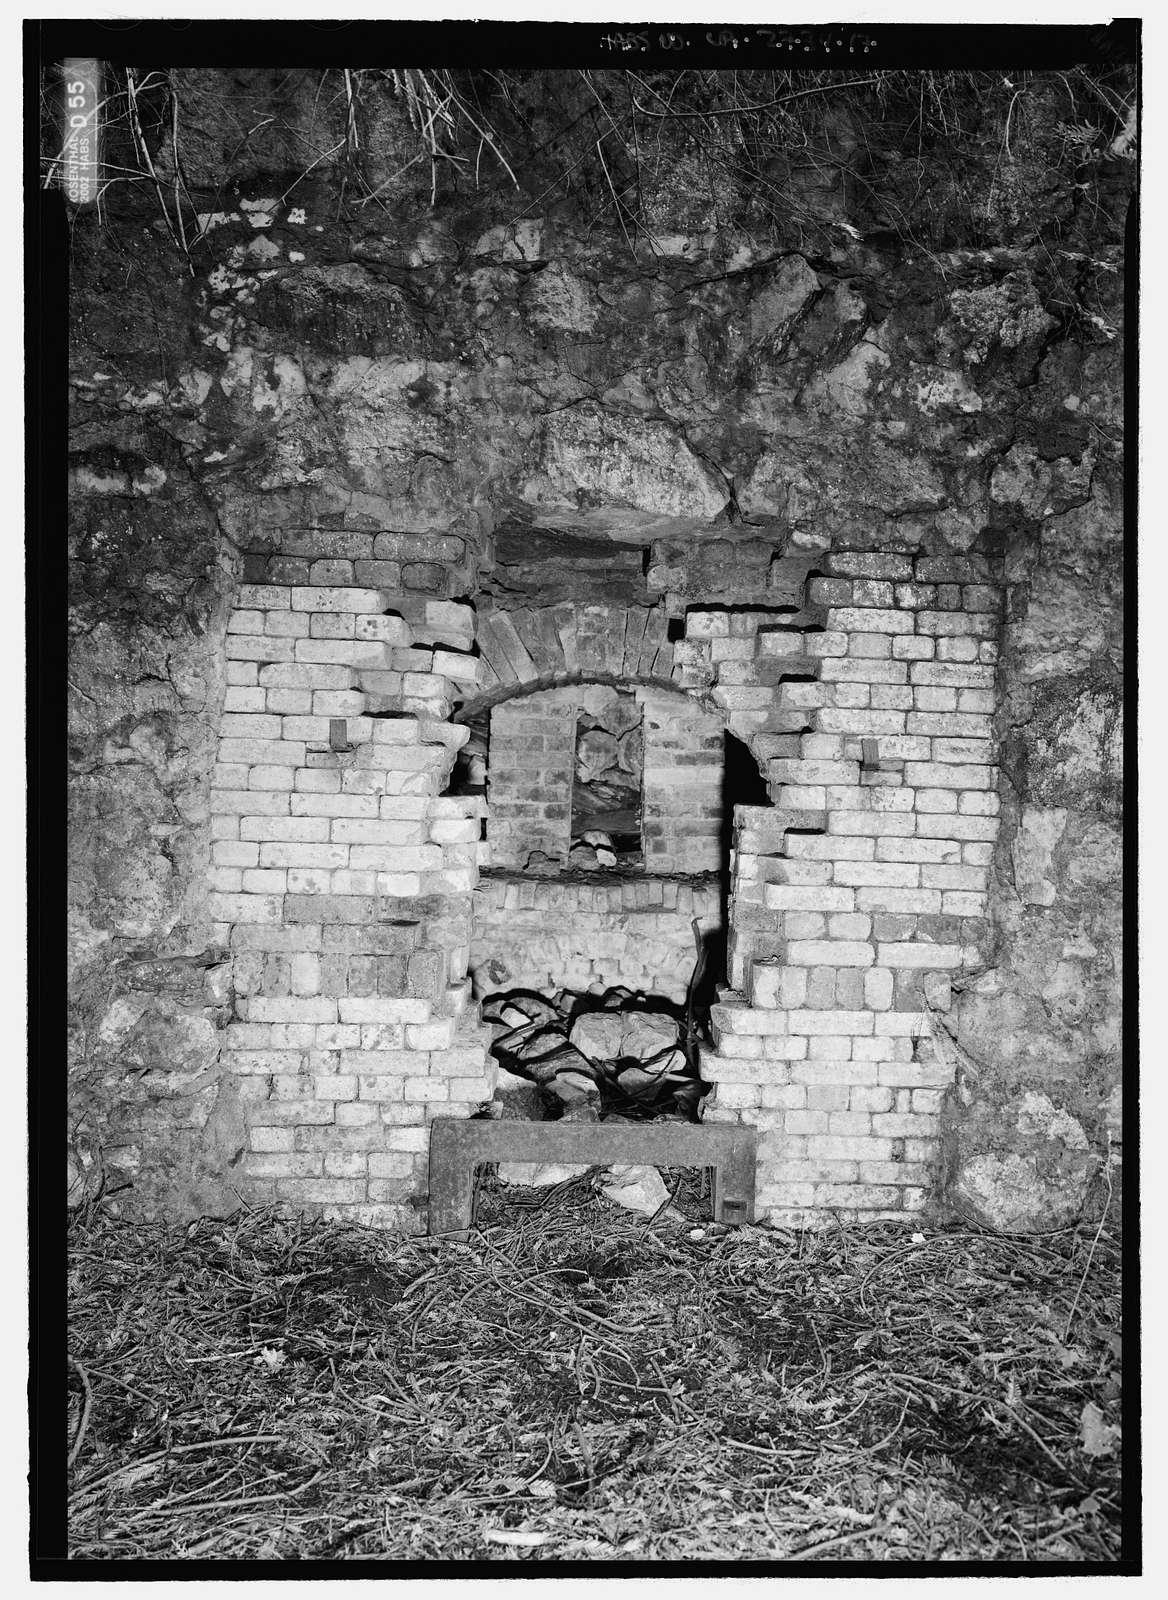 Four Lime Kilns, 63025 Highway 1, Big Sur, Monterey County, CA